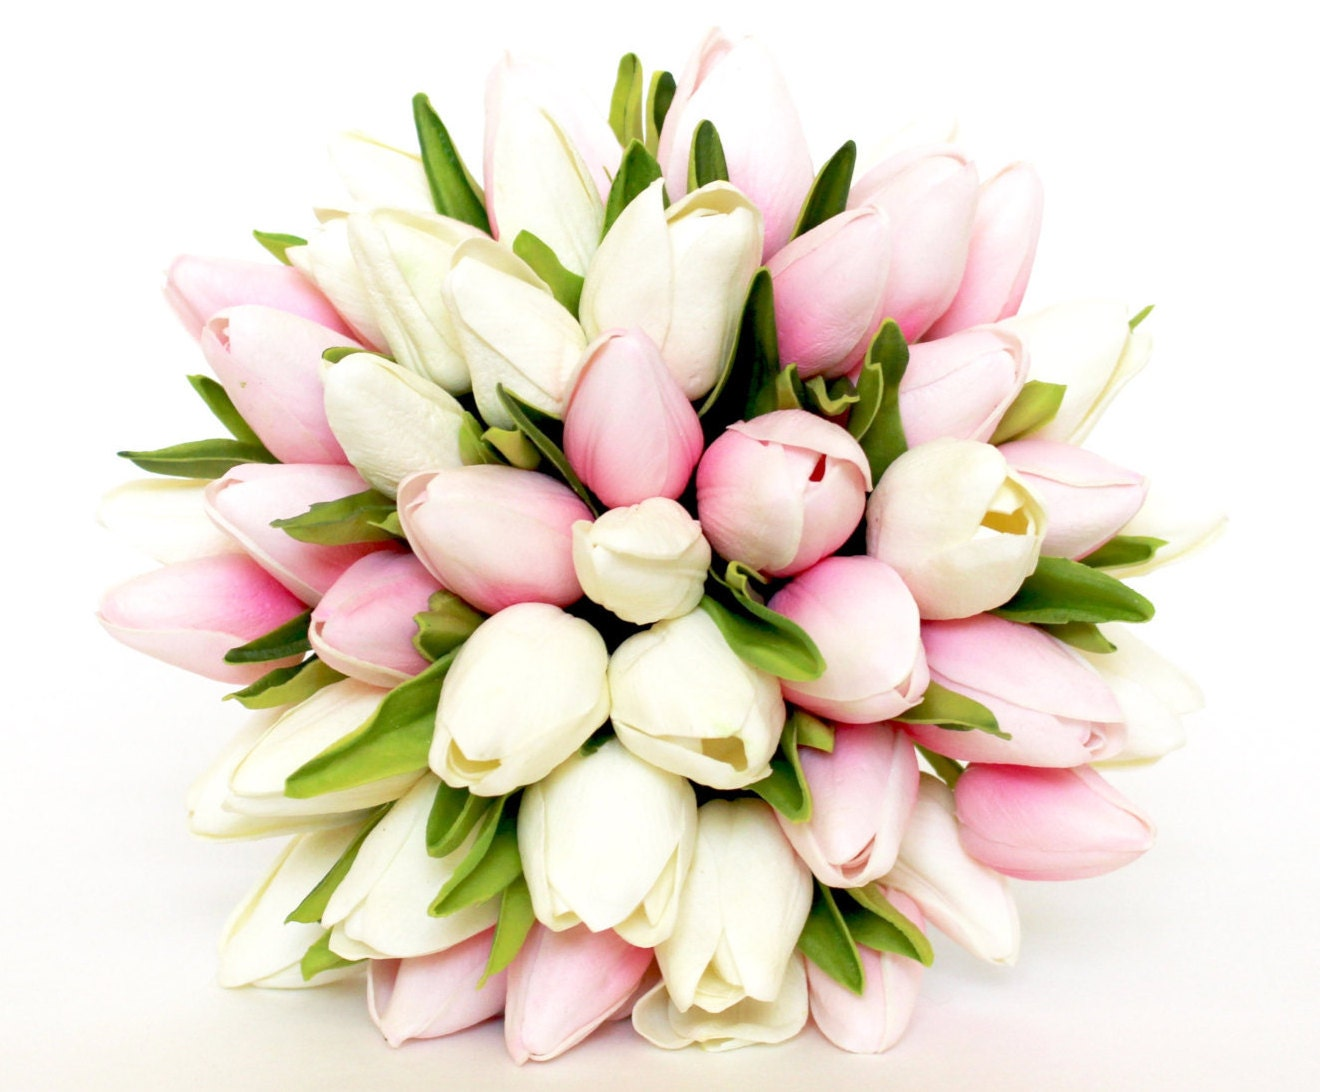 Brudebuketten Tulip Pink brudebuketten Pink og hvid-4183